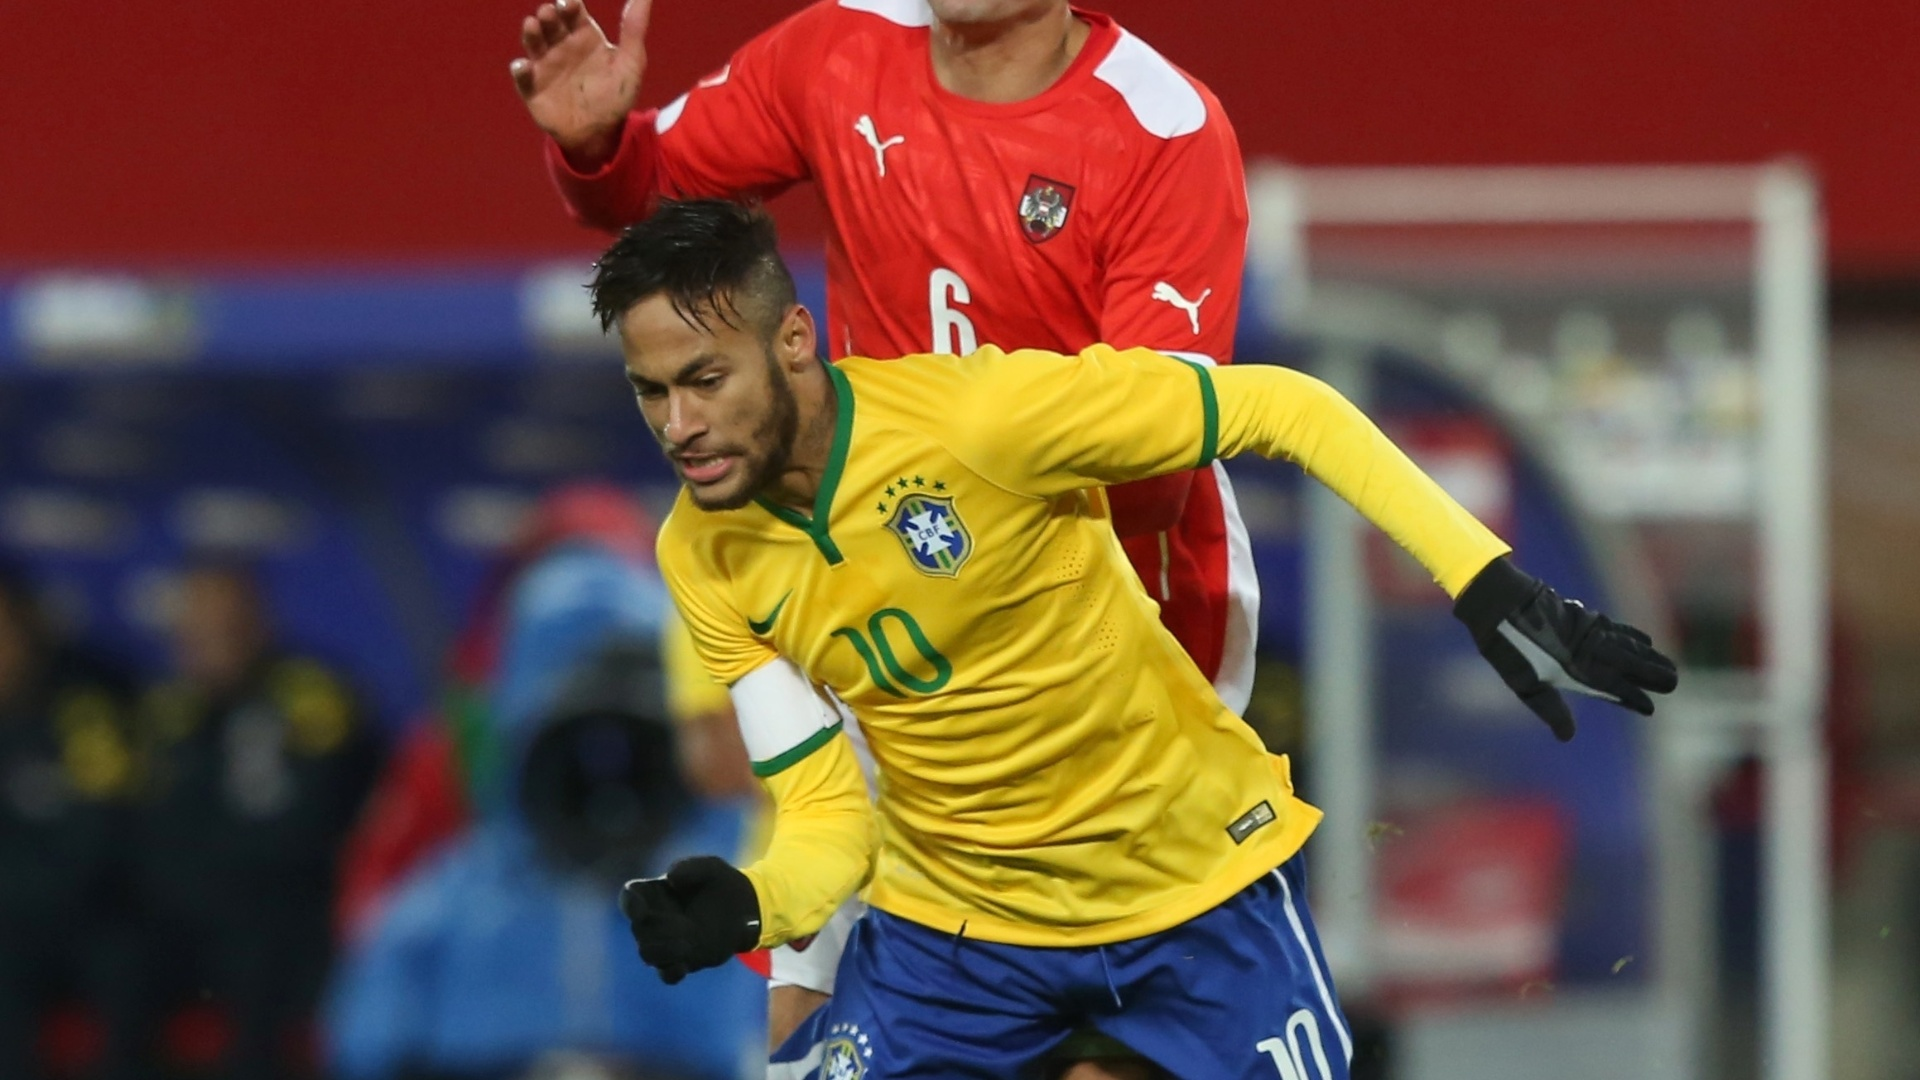 Neymar (frente) tenta superar a marcação do austríaco Ilsanker durante amistoso do Brasil